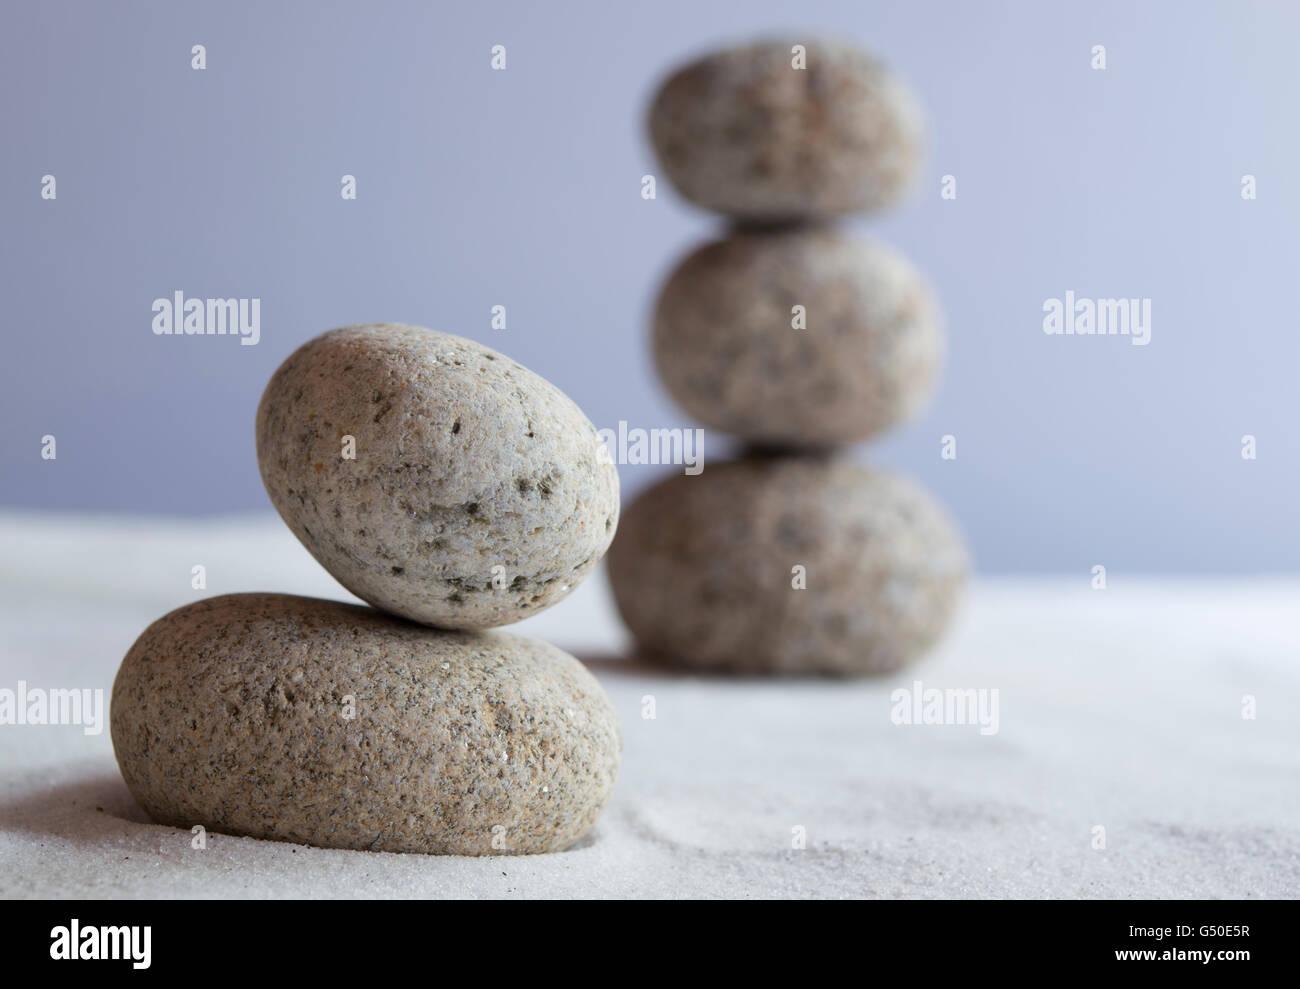 Meditative stones in balance on white sand - Stock Image